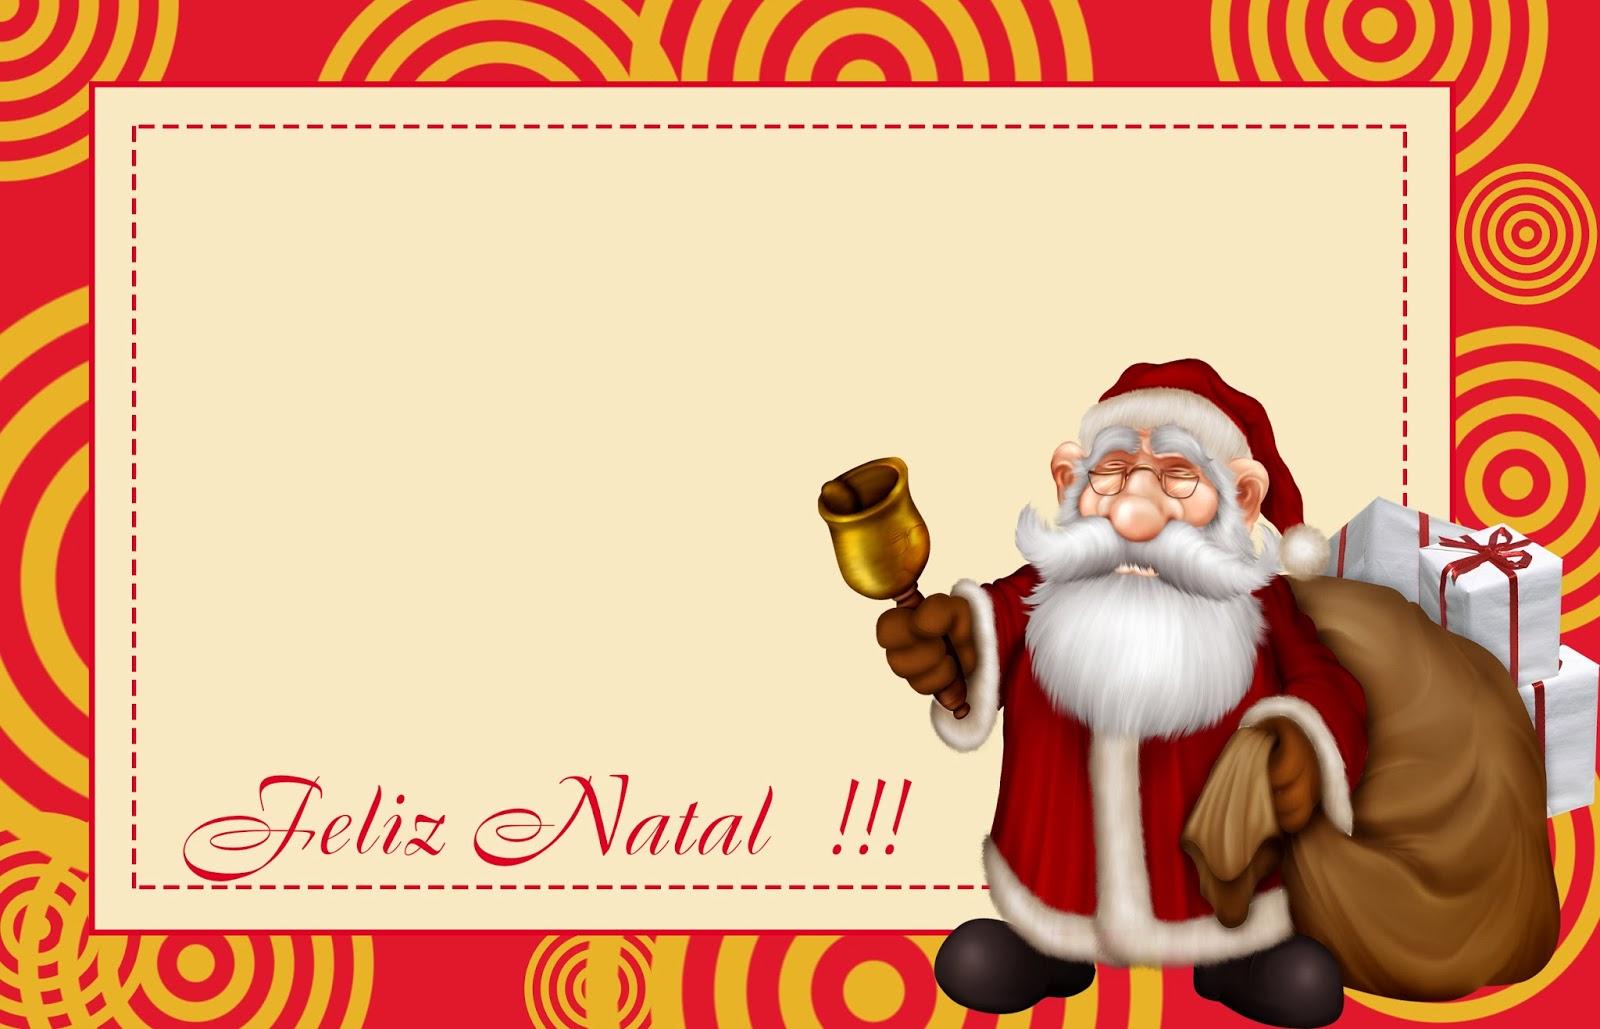 Jose Tanco Natal Facebook